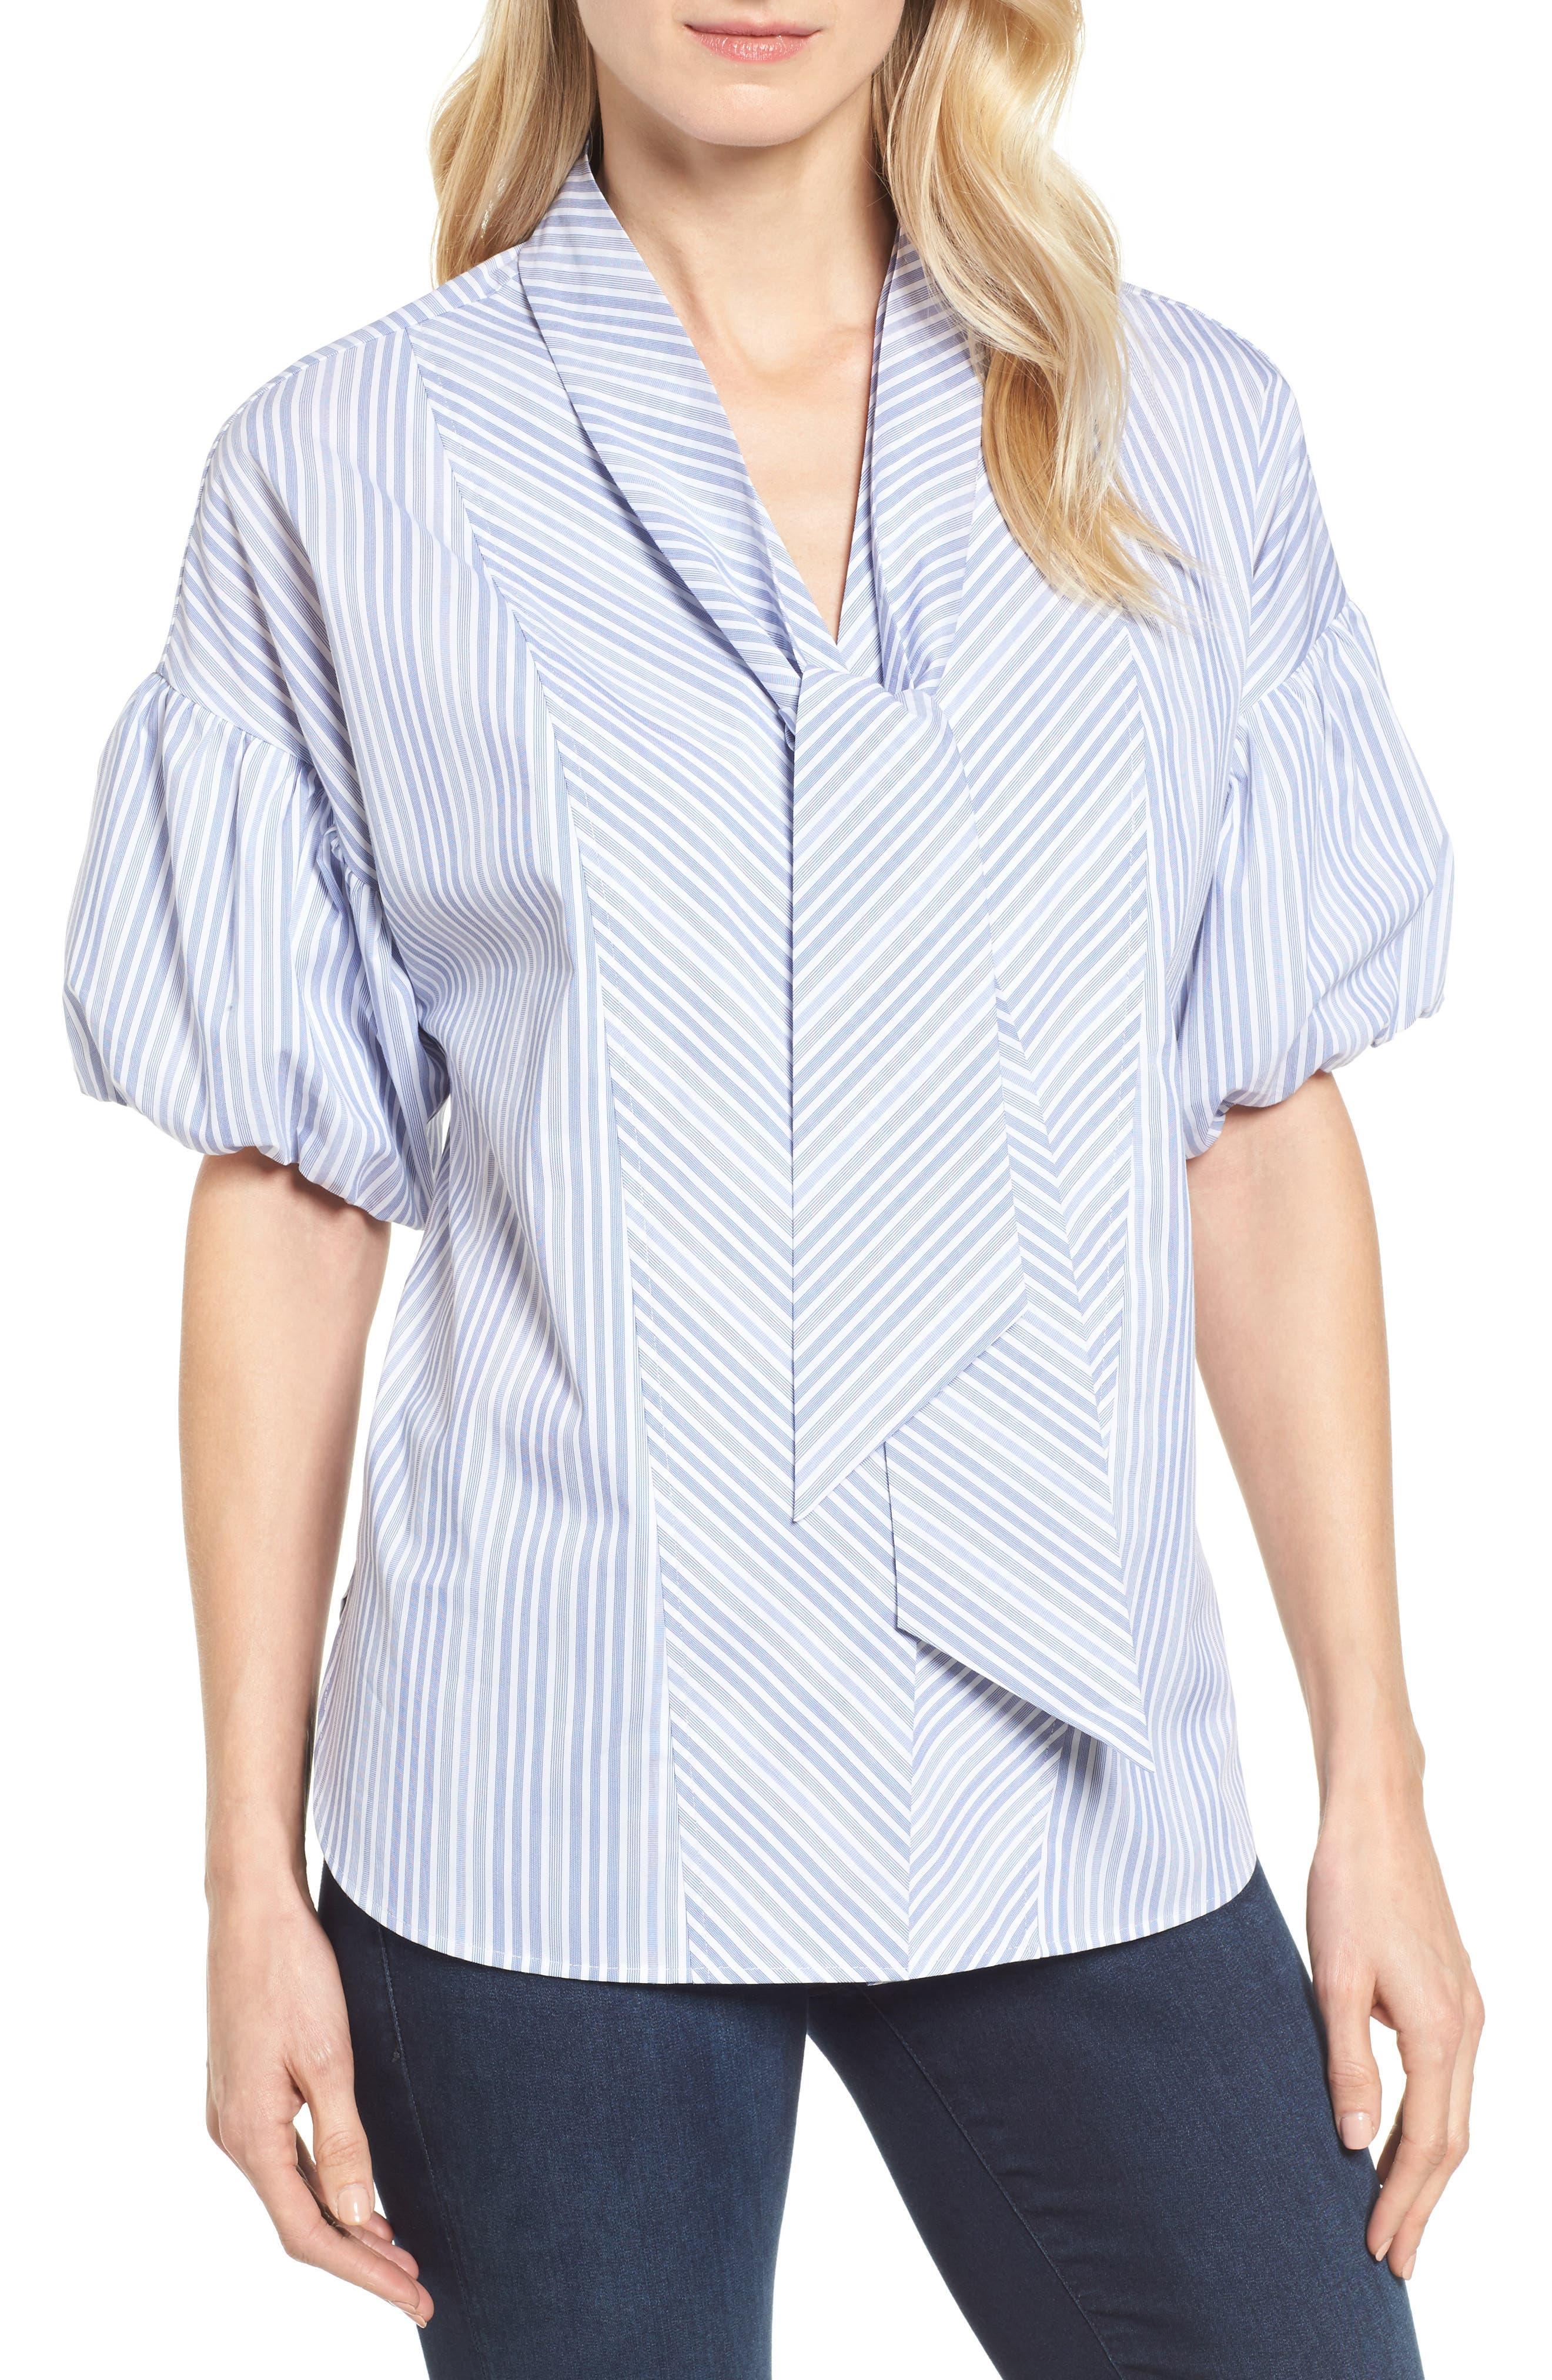 Tie Front Short Sleeve Blouse,                             Main thumbnail 1, color,                             Blue- White Stripe